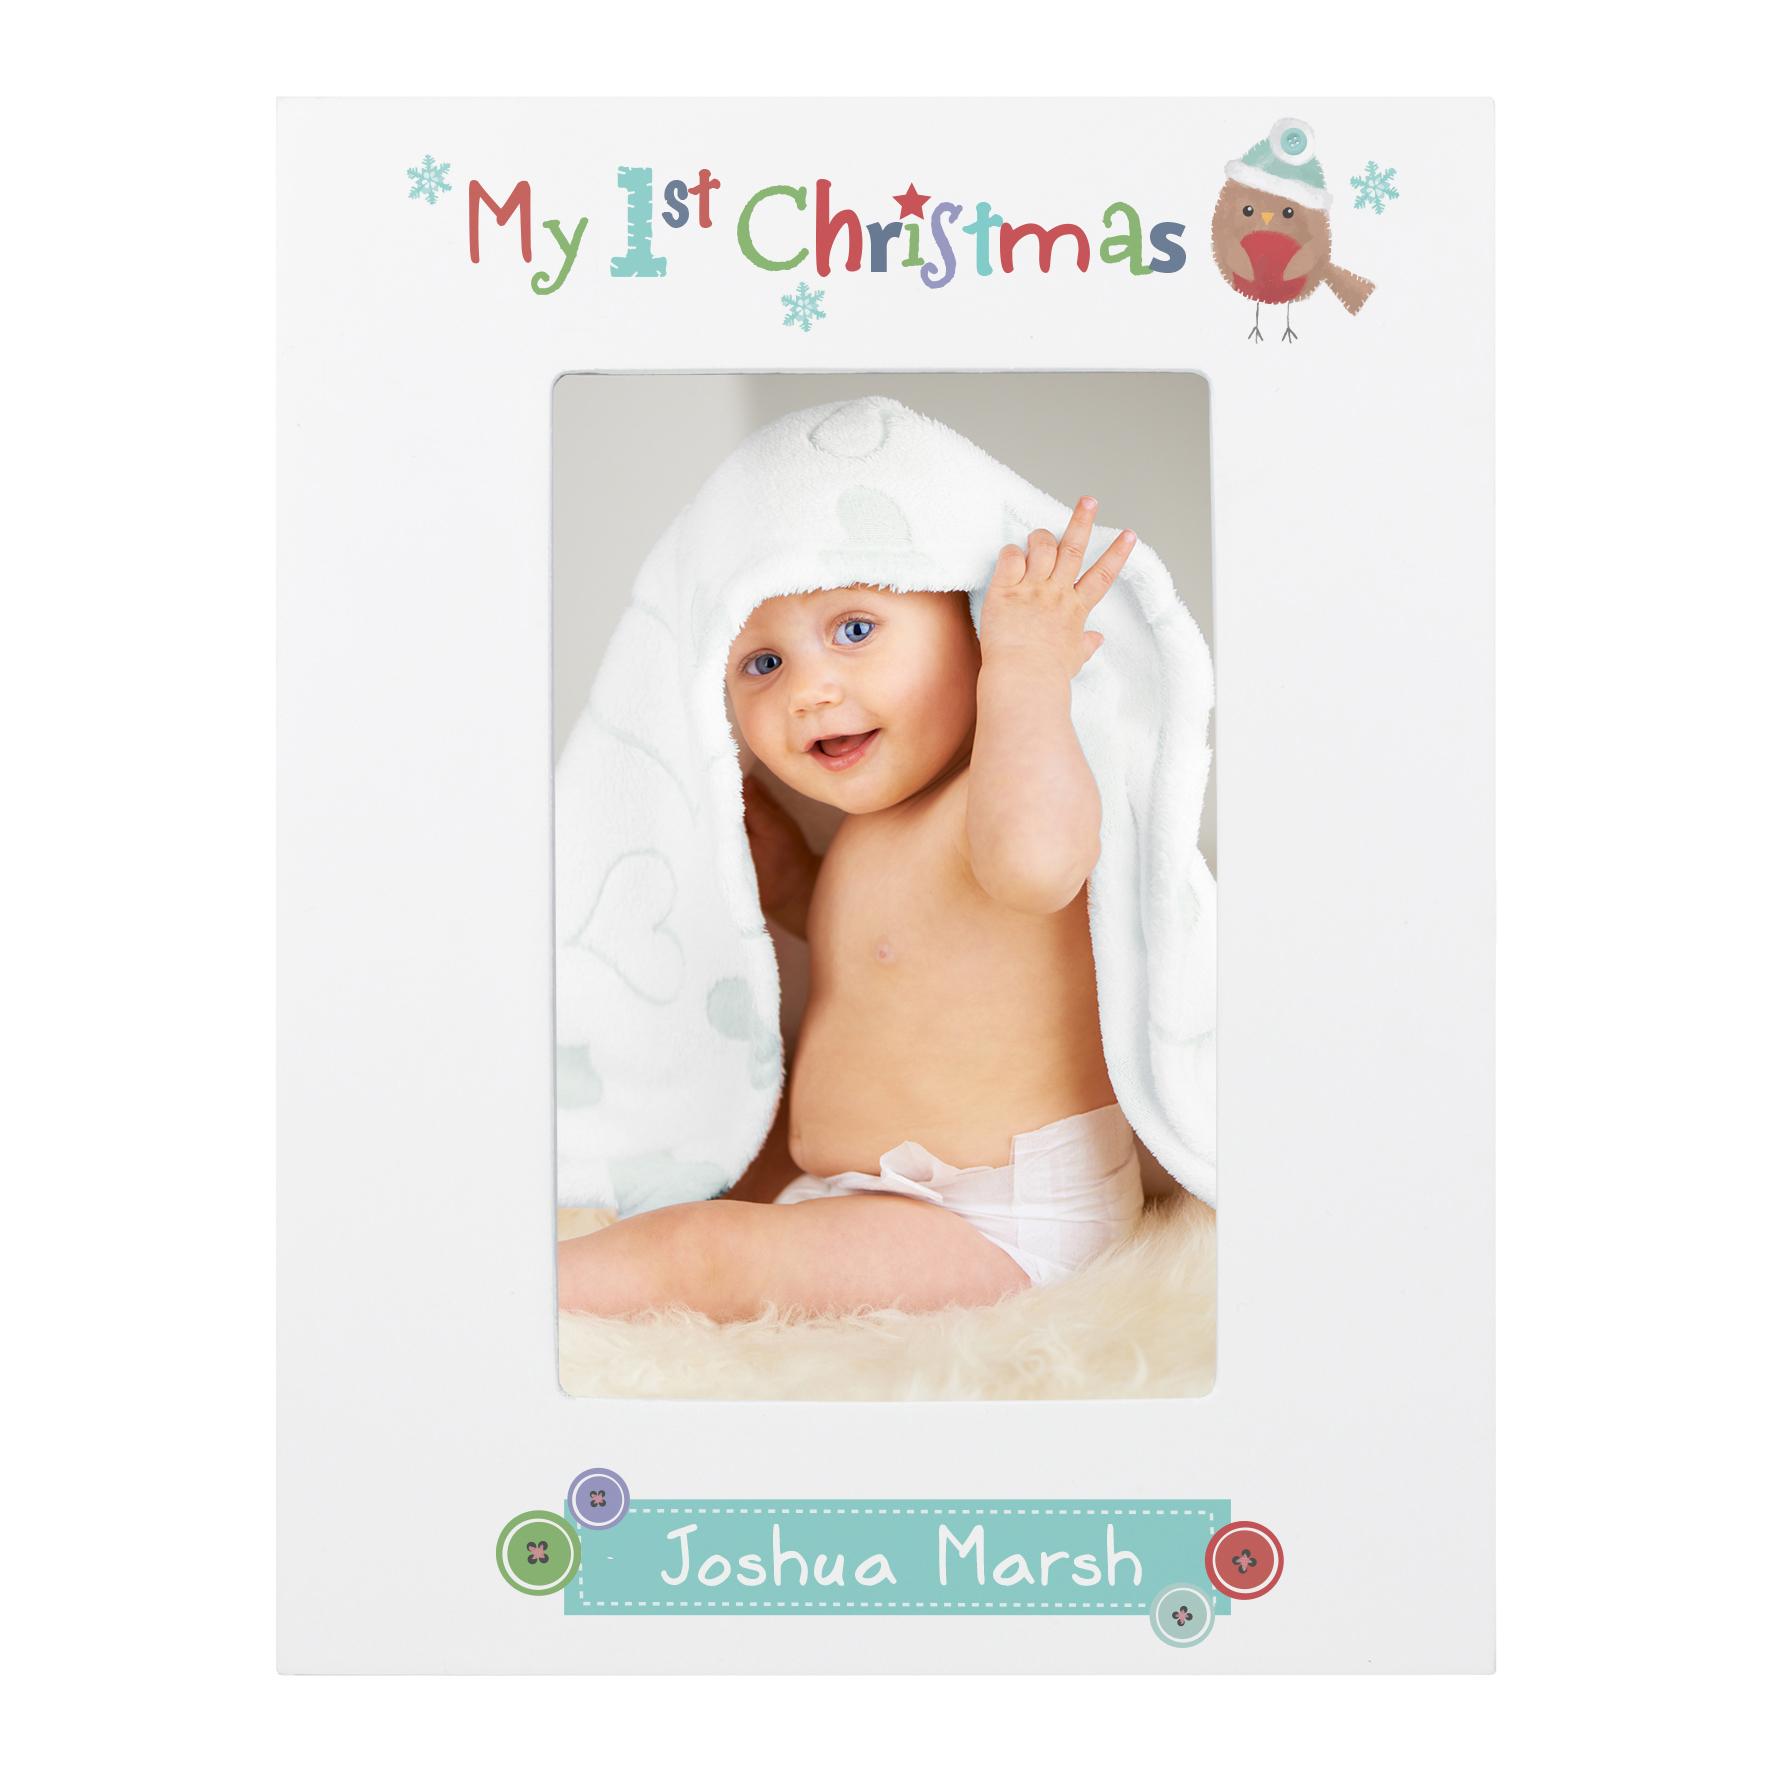 Personalised Felt Stitch Robin My 1st Christmas 6x4 White Wooden Frame